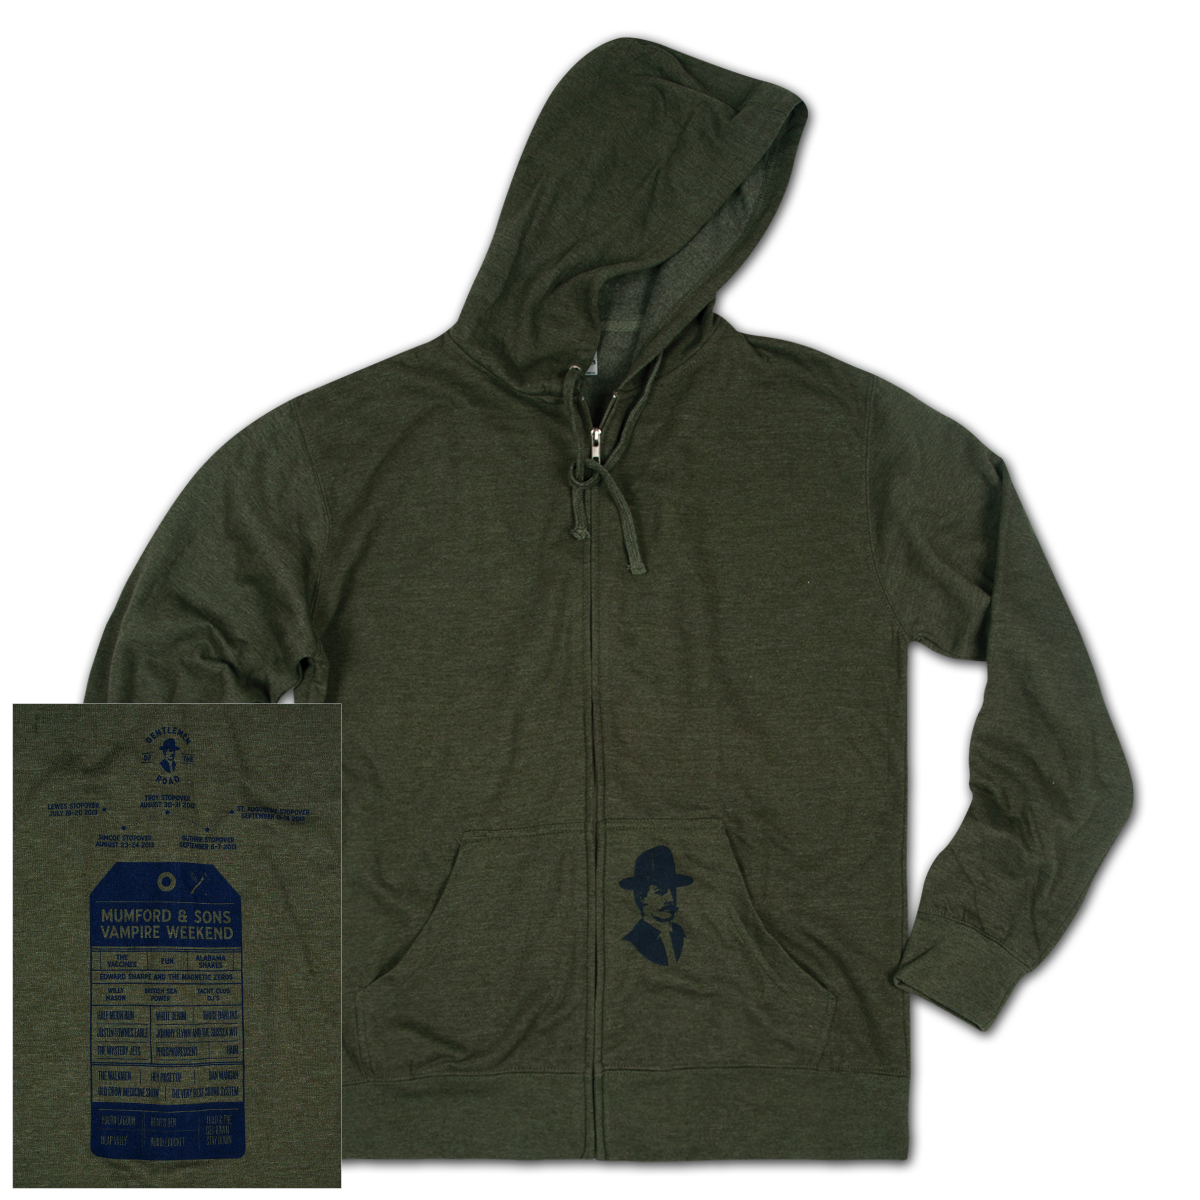 GOTR 2013 Willis Pocket Print Unisex Zip Hoodie